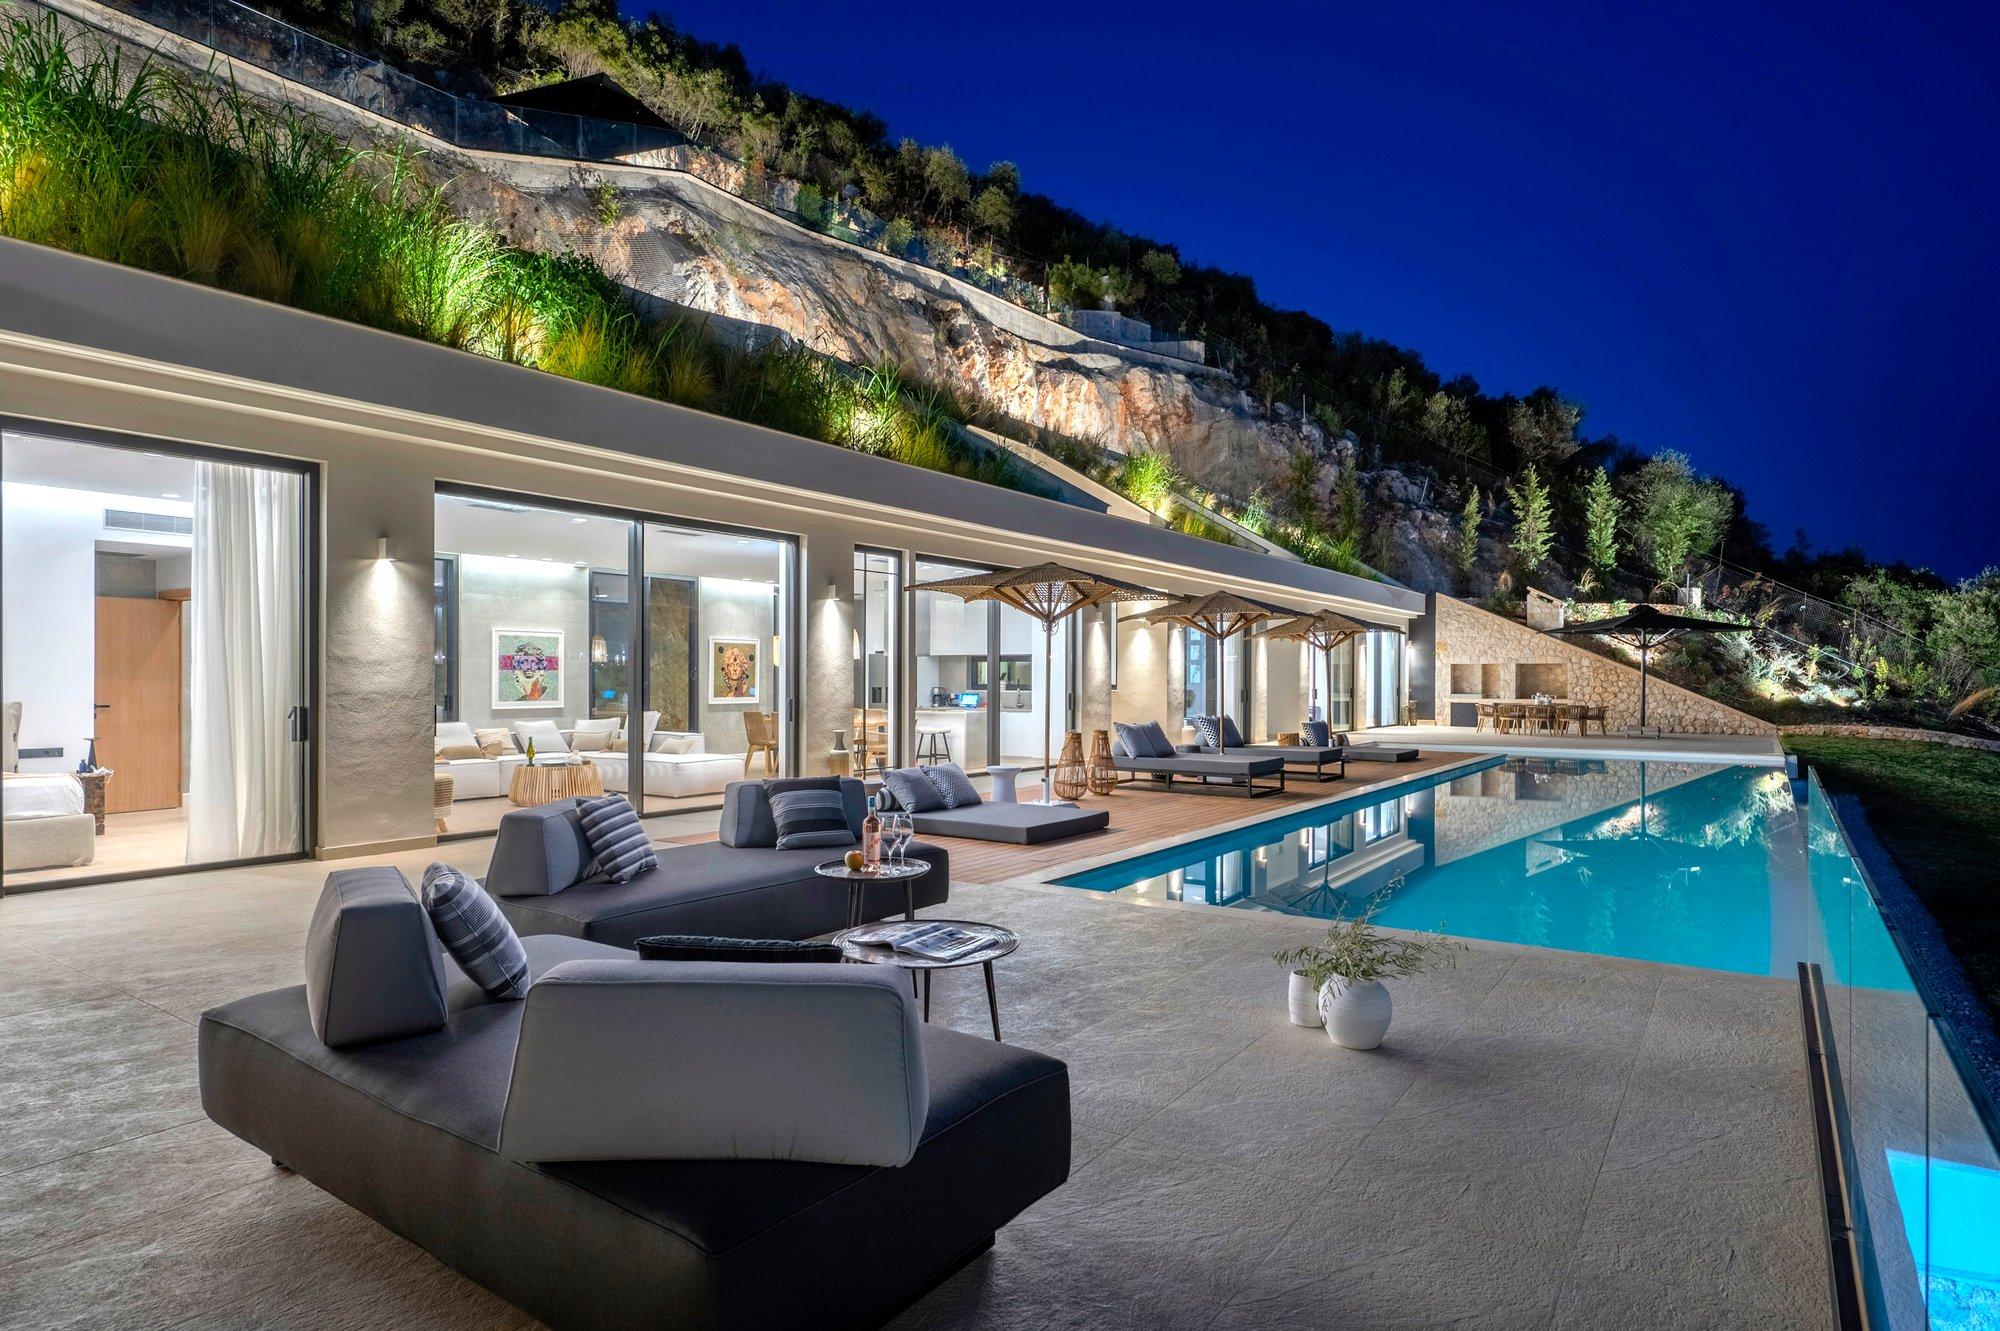 House in Greece 1 - 11638600